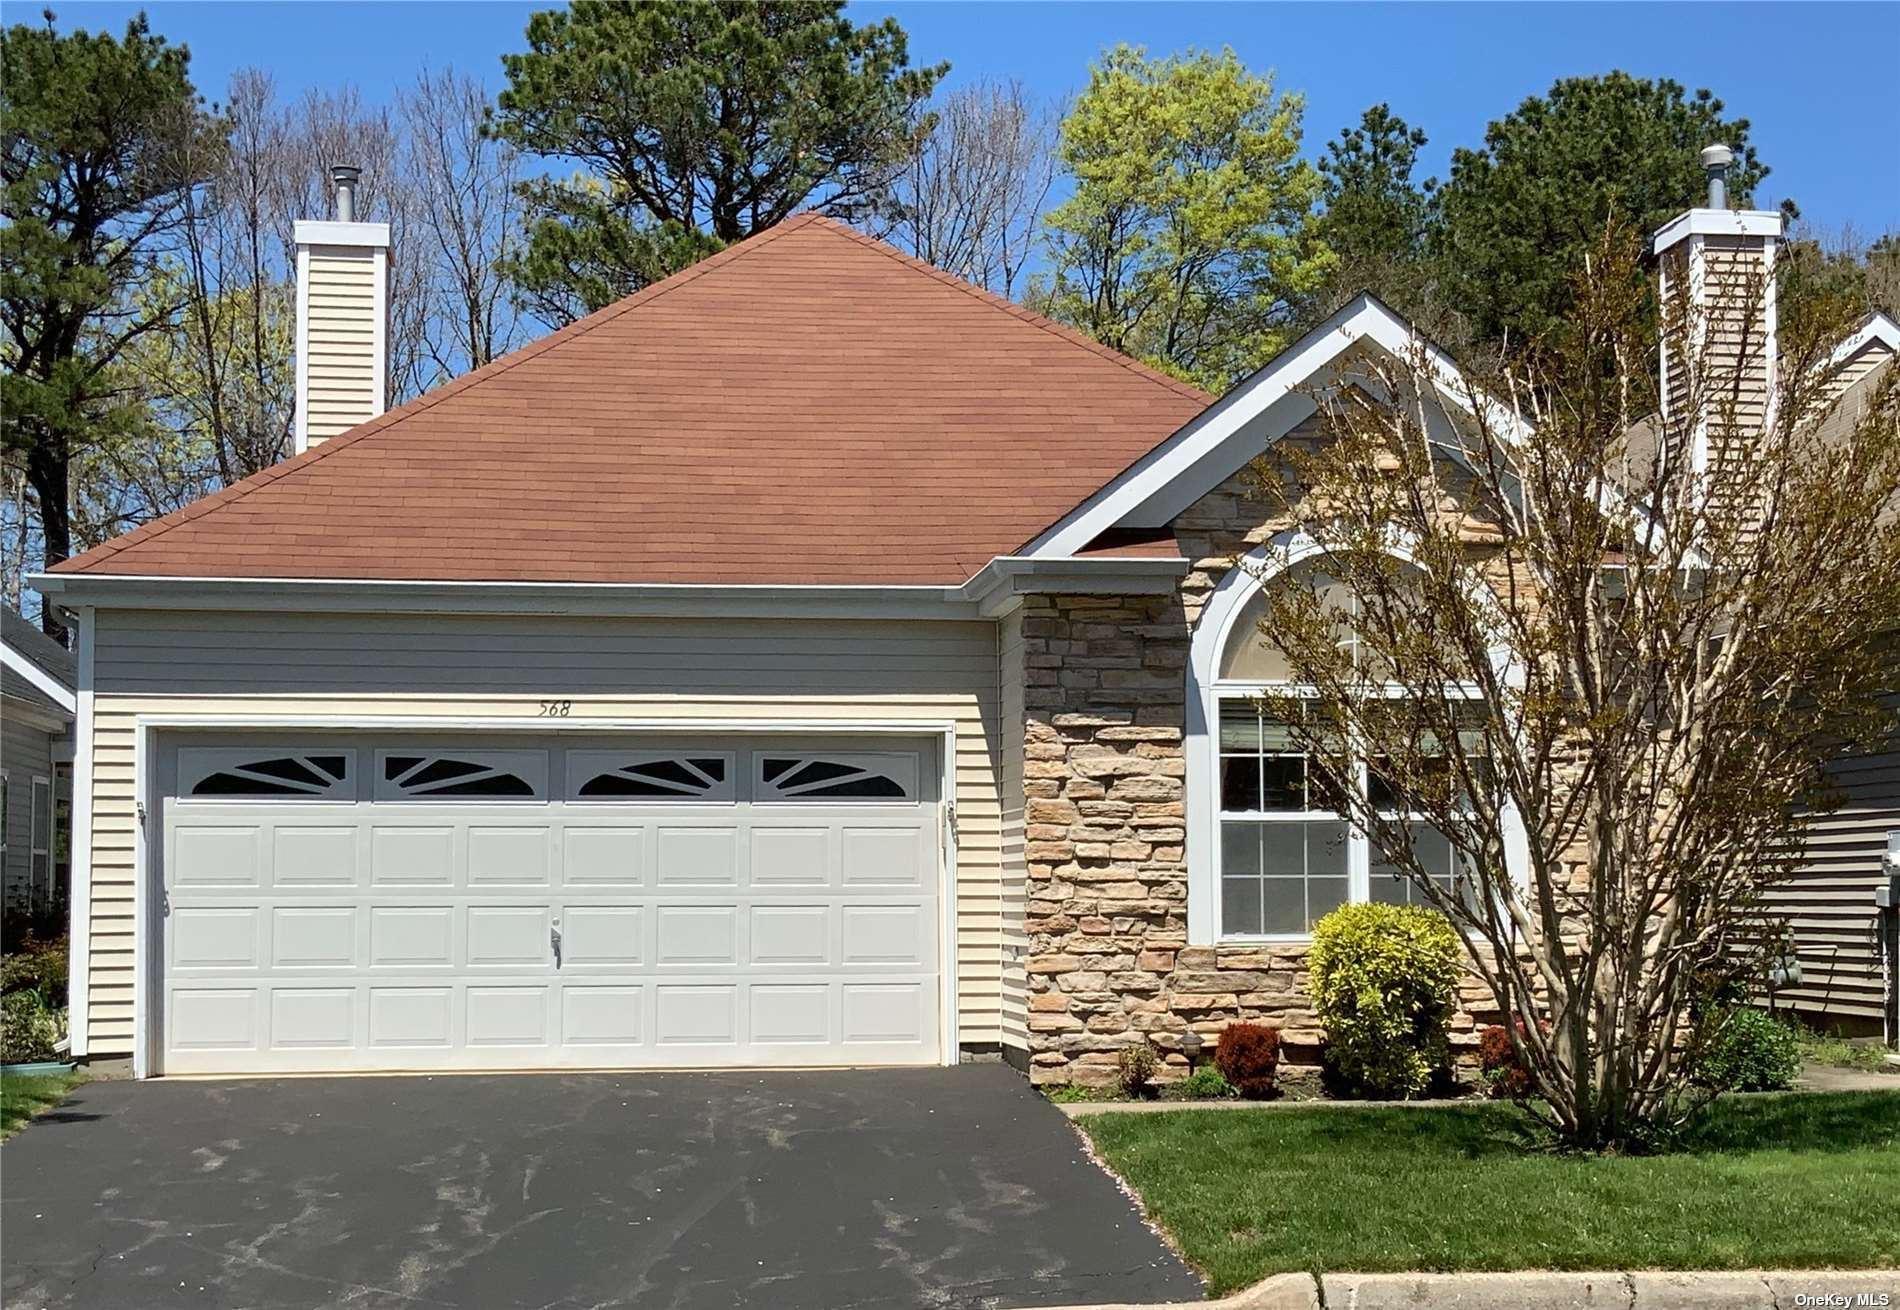 568 Leisure Drive, Ridge, NY 11961 - MLS#: 3310894